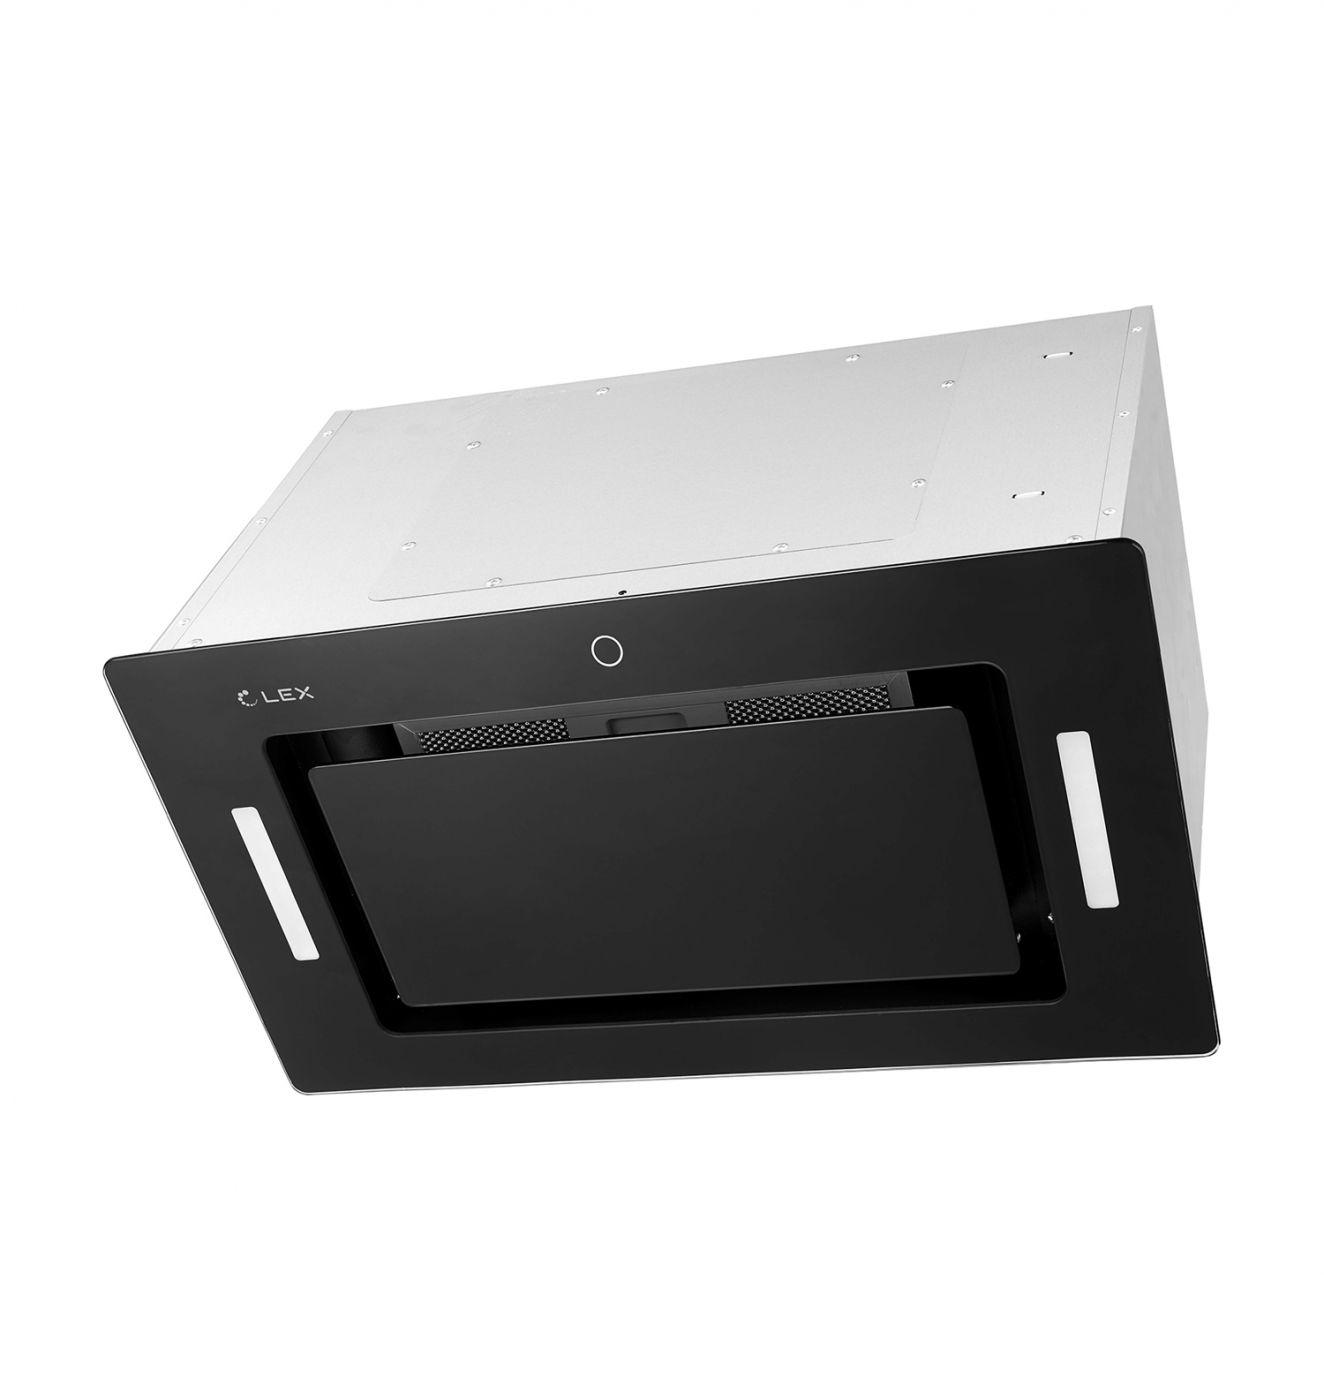 Встраиваемая вытяжка LEX GS BLOC GS 600 black CHTI000361